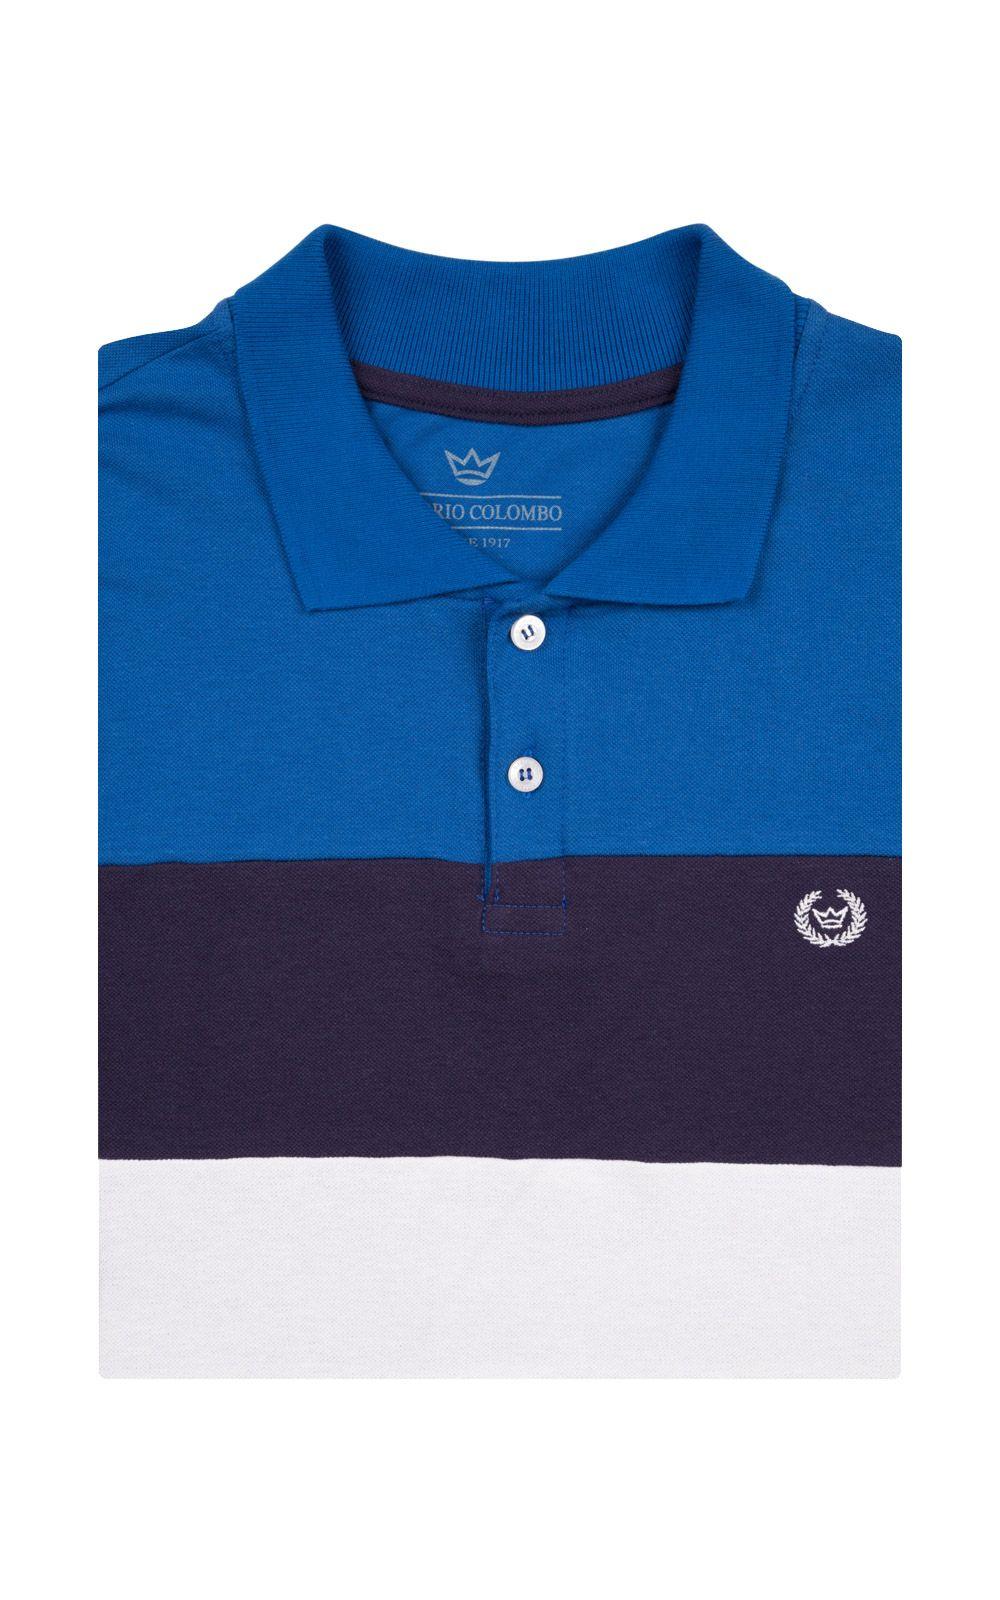 Foto 4 - Camisa Polo Masculina Azul Listrada